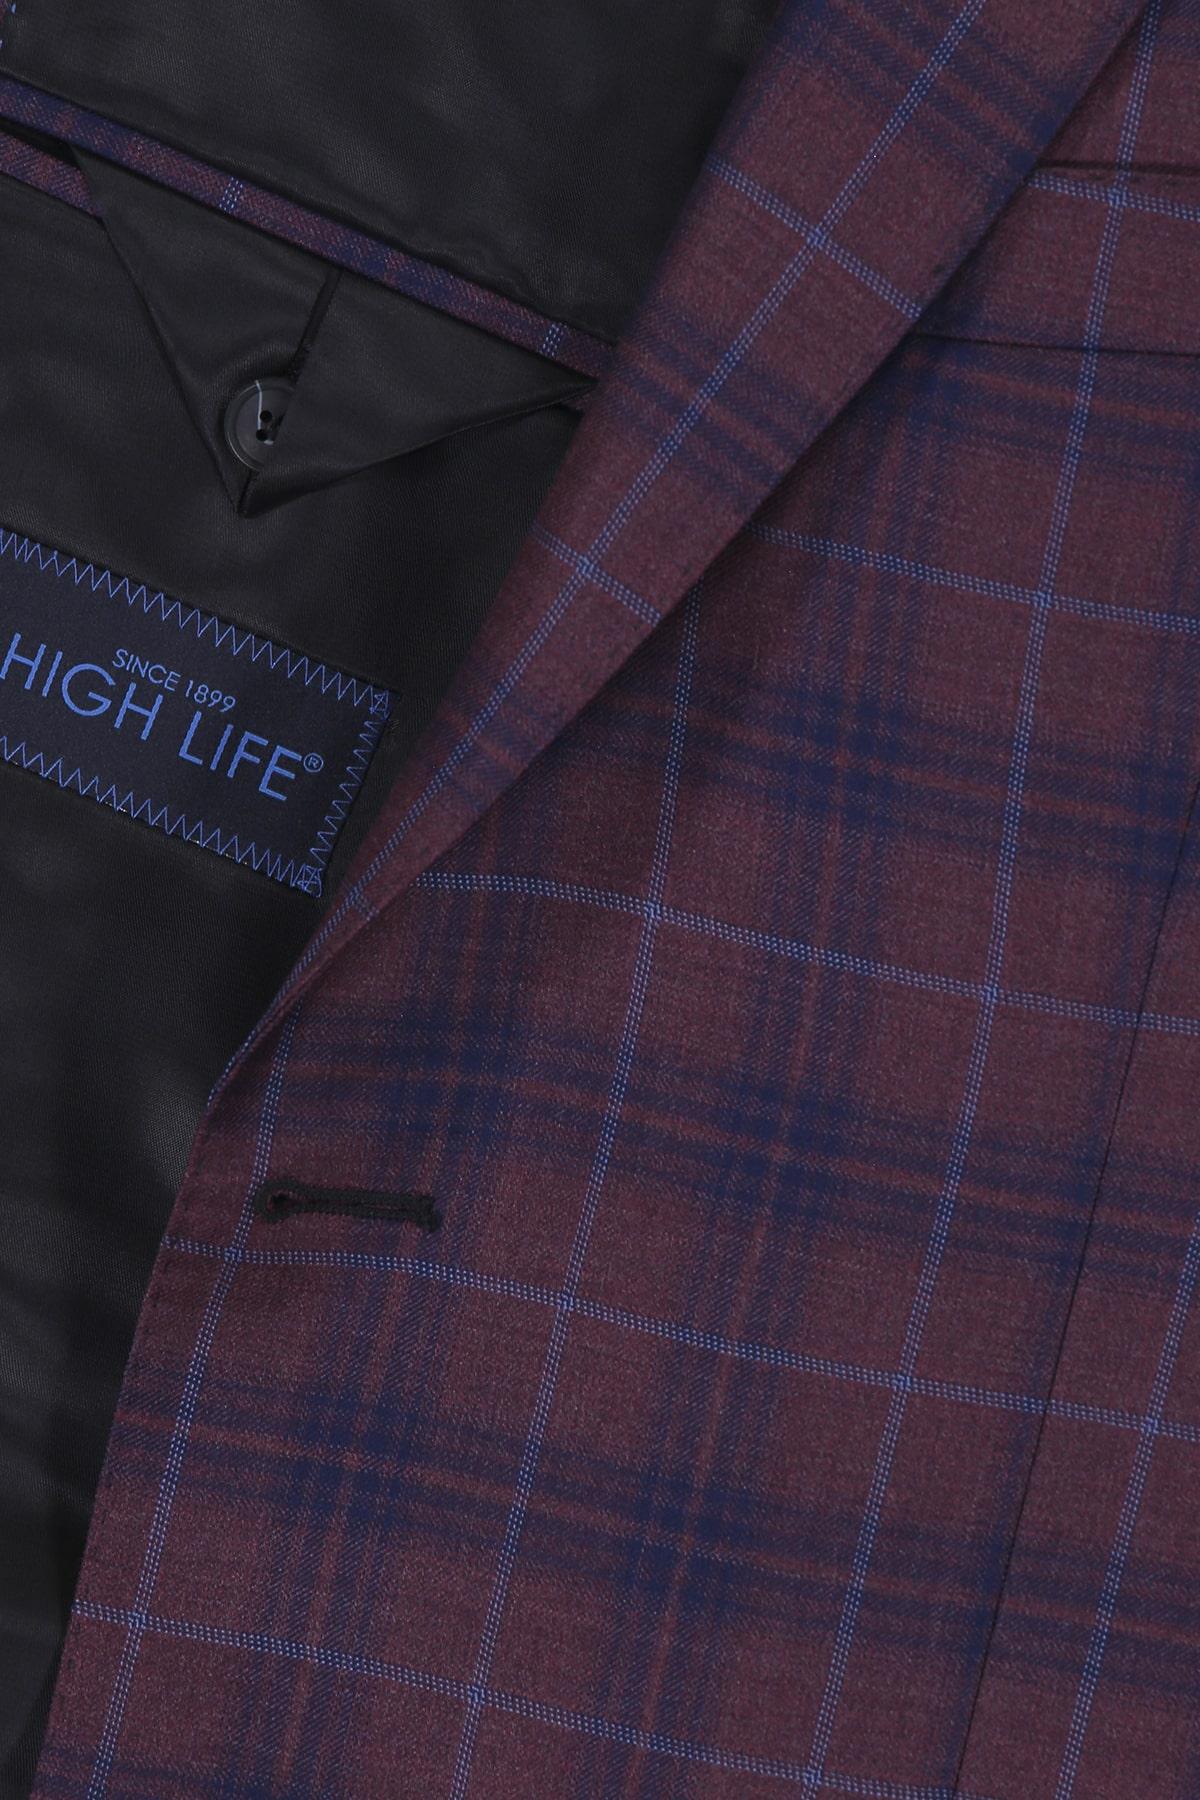 Saco Formal High Life Vino, Tejido 100% Lana Super 120´s, Corte Slim.